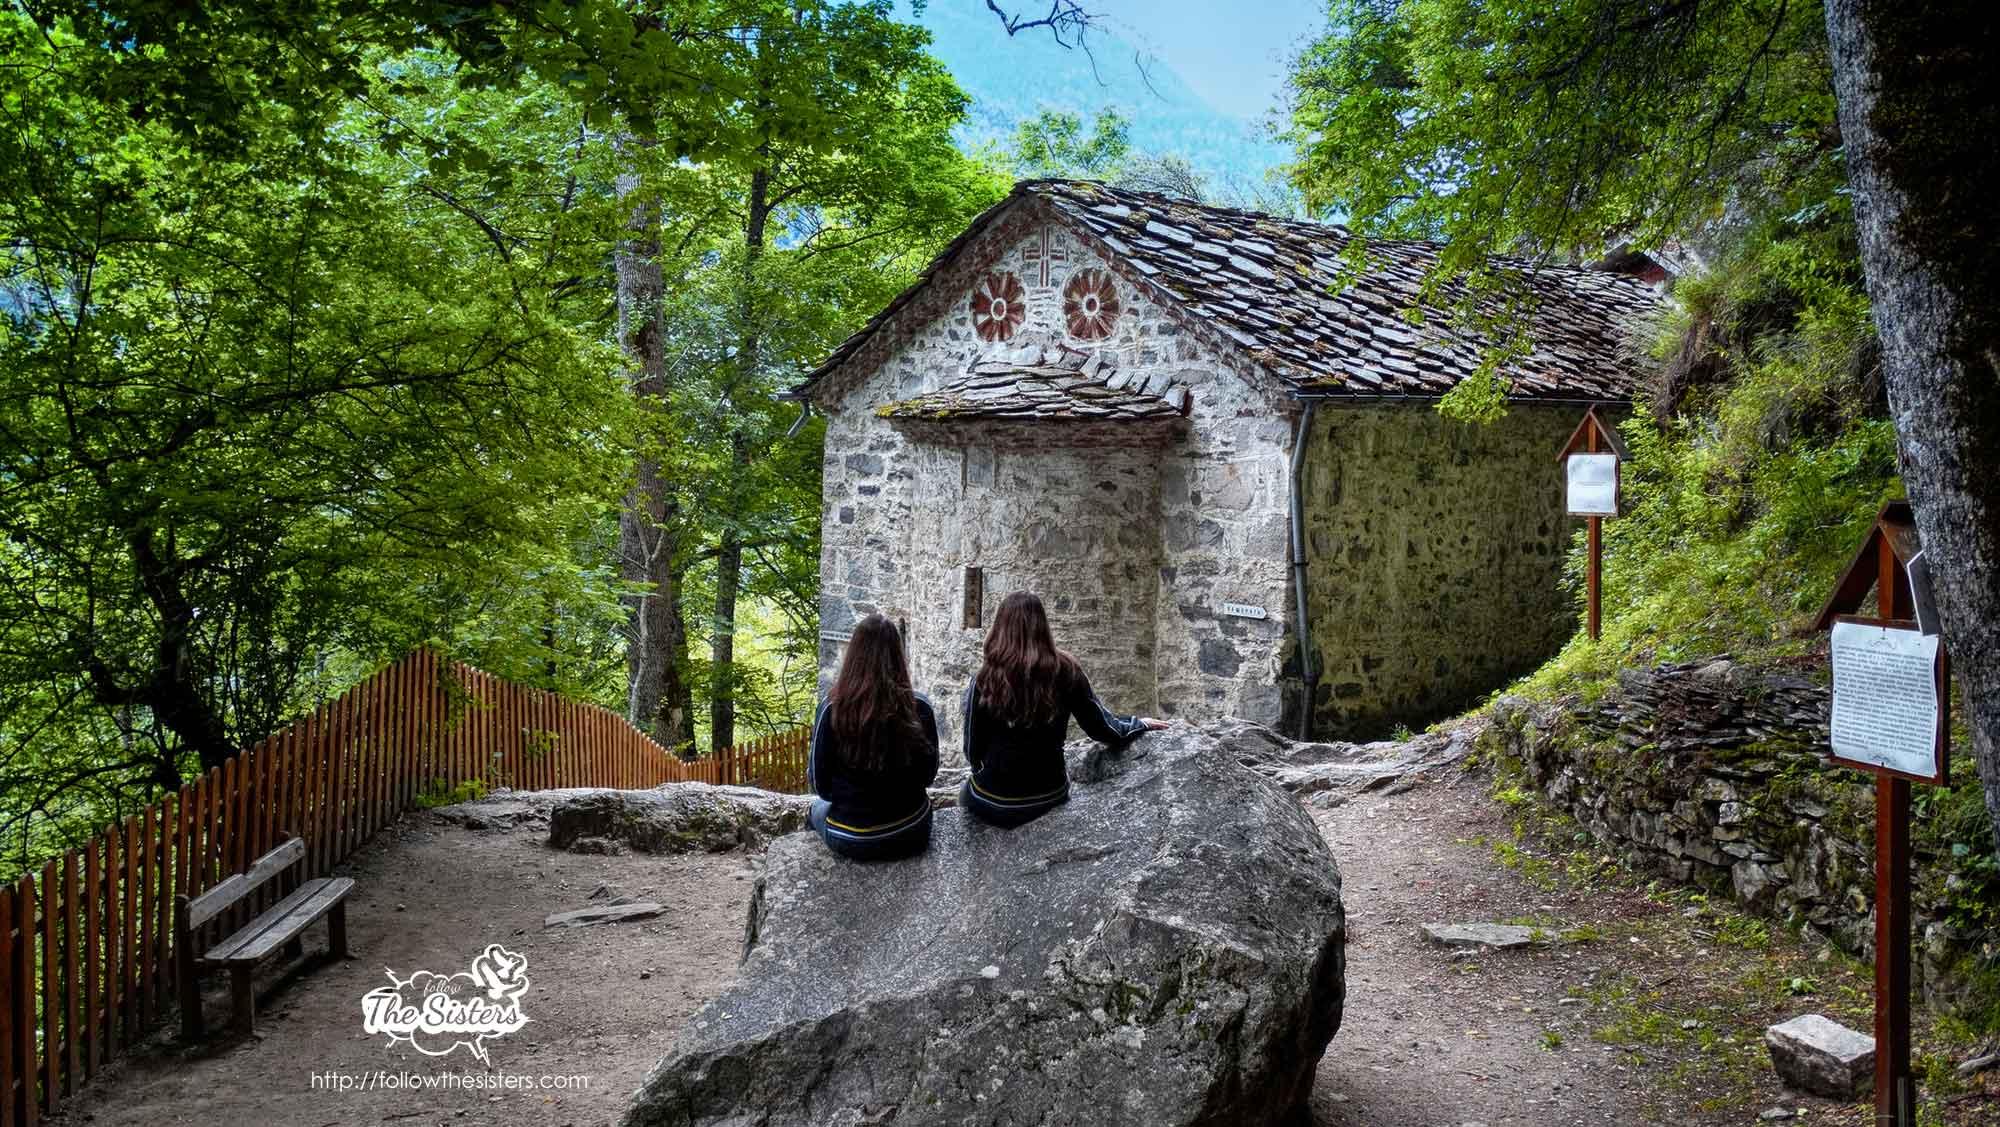 Nina and Ellie at St. Ivan Rilski's cave